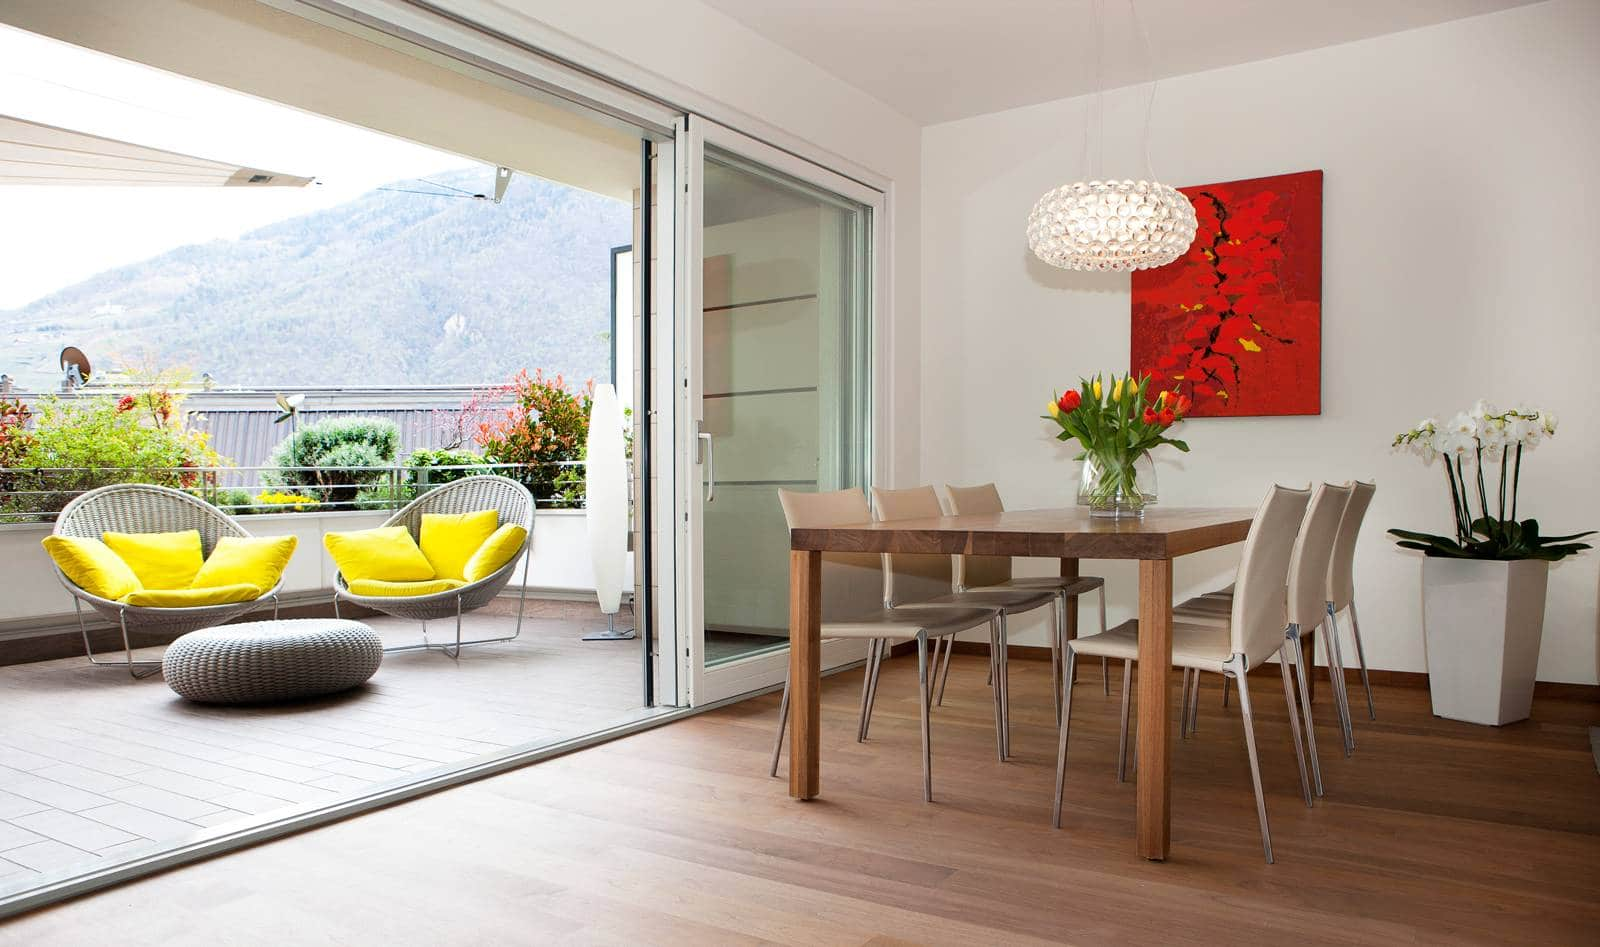 Dise o de planos de apartamento e interior construye hogar for Apartamentos de diseno pequenos